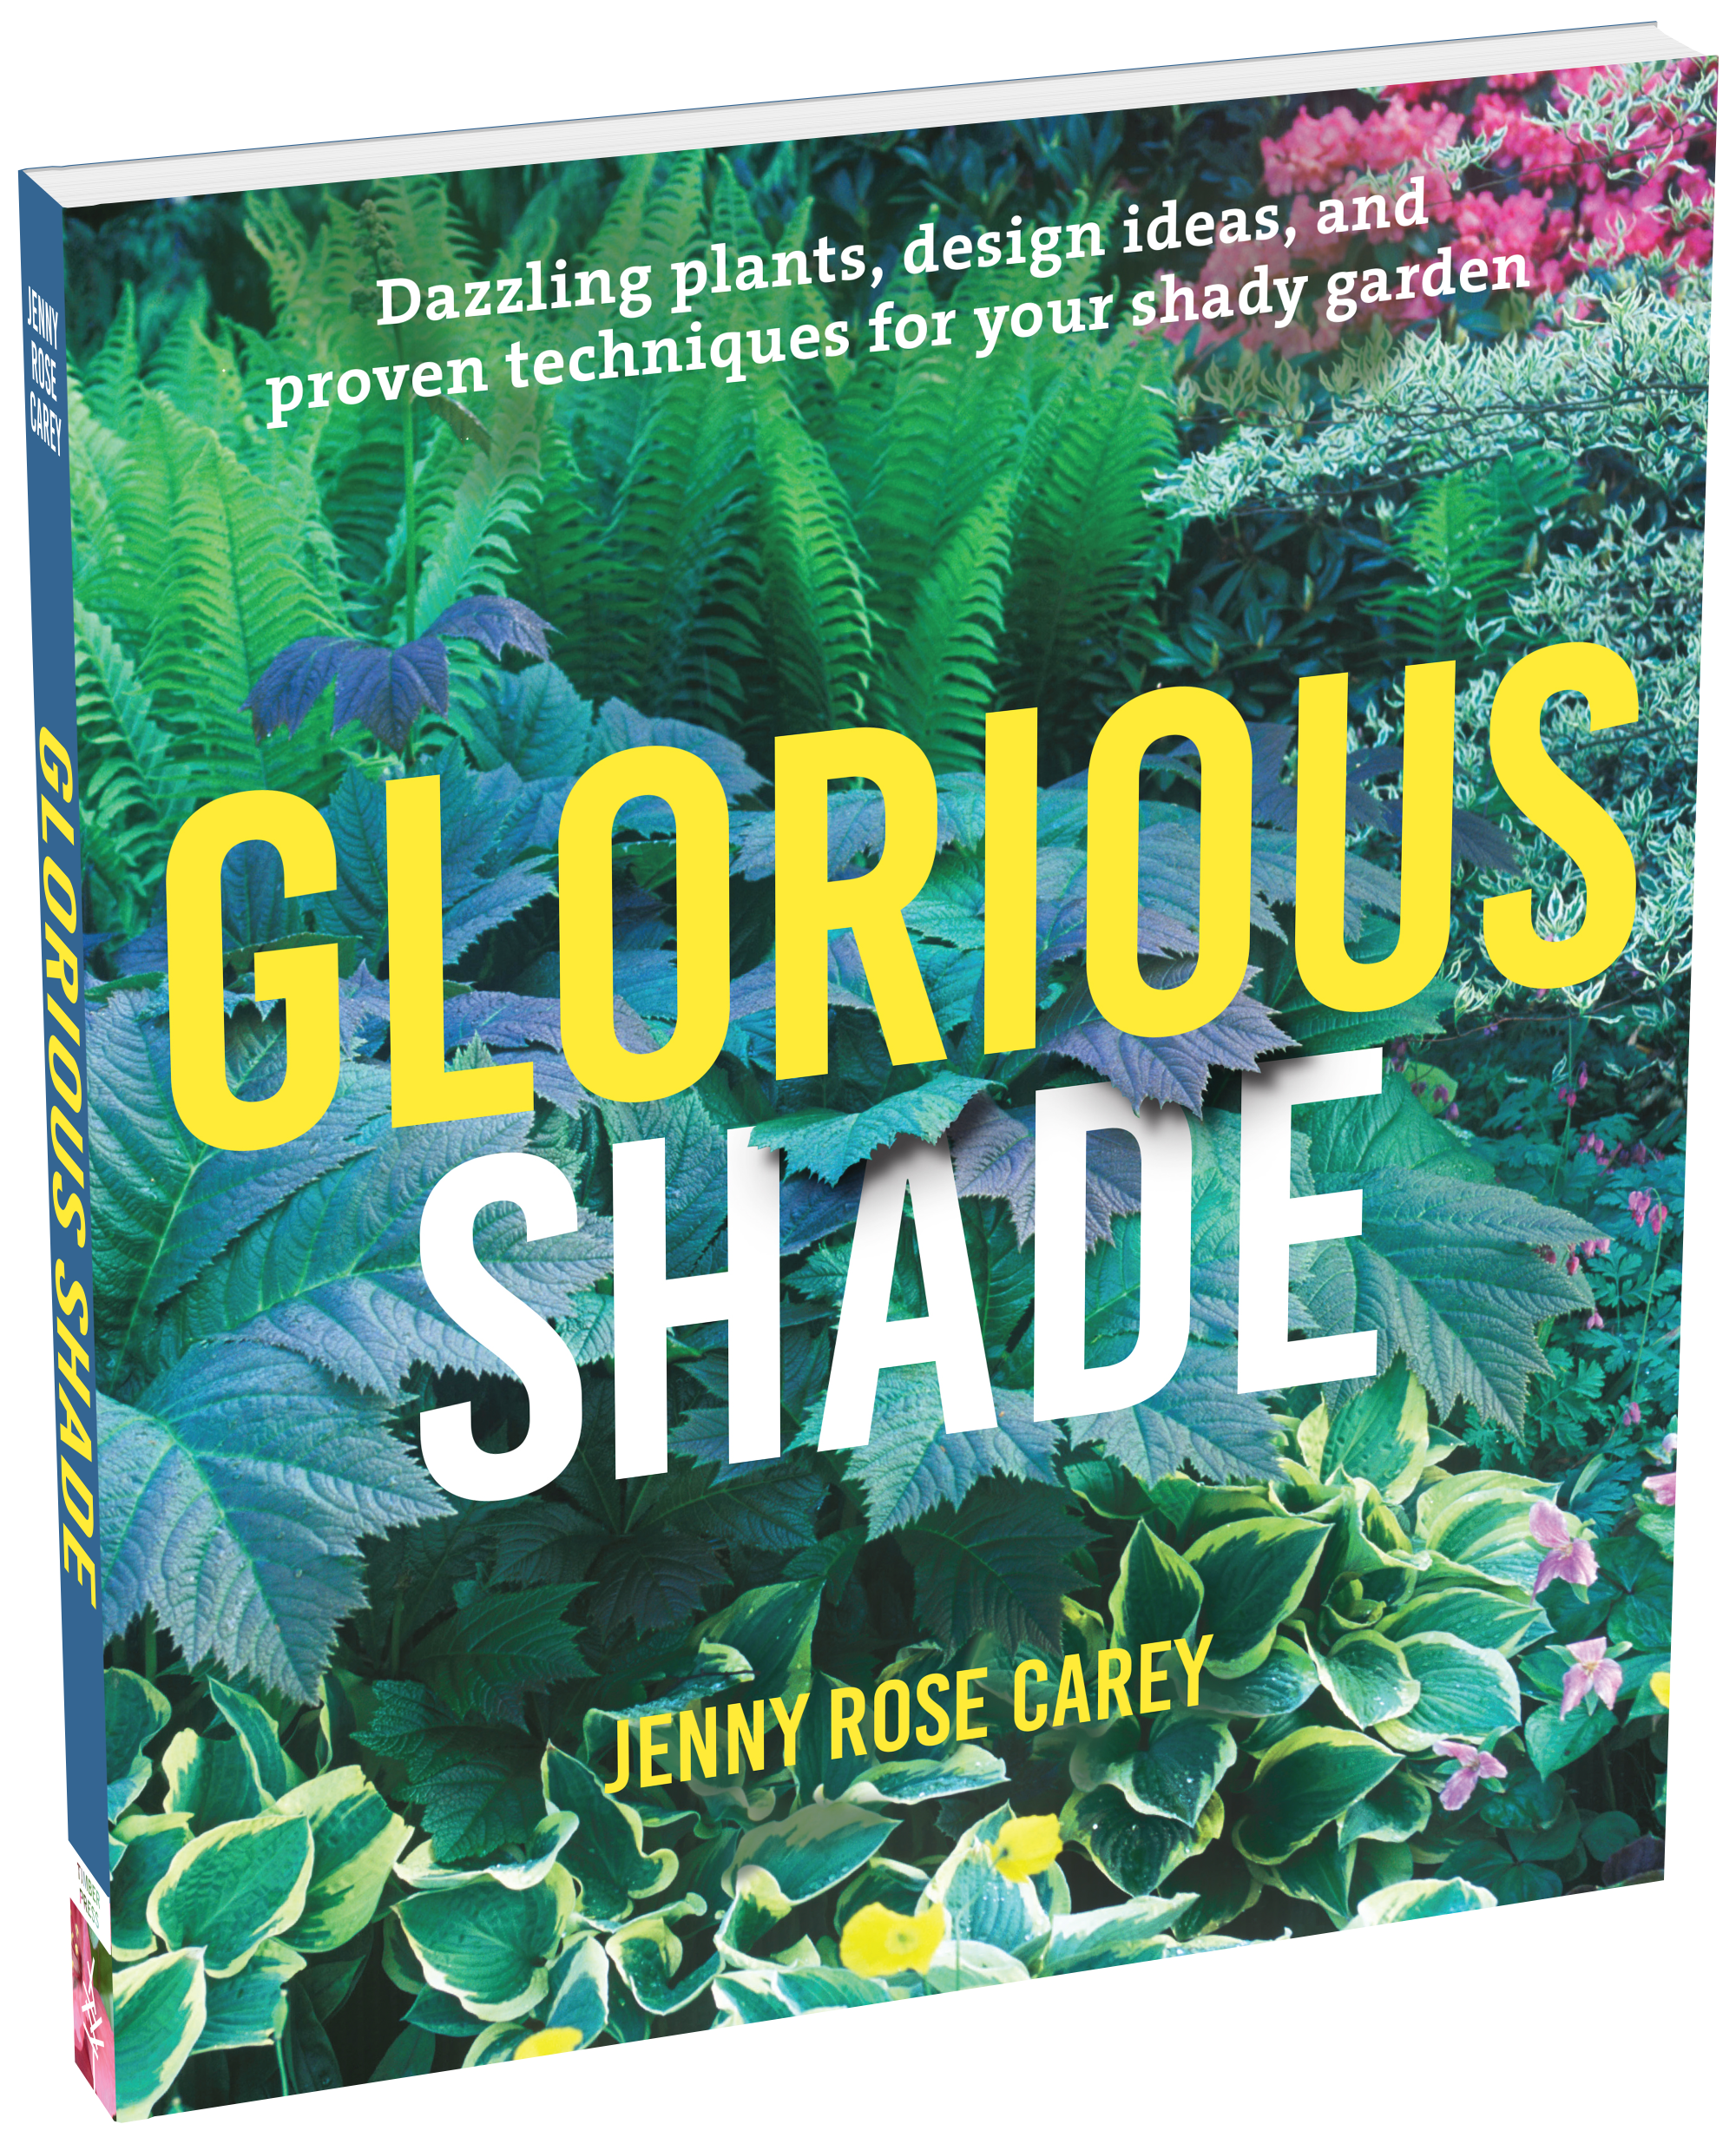 Glorious Shade - Workman Publishing